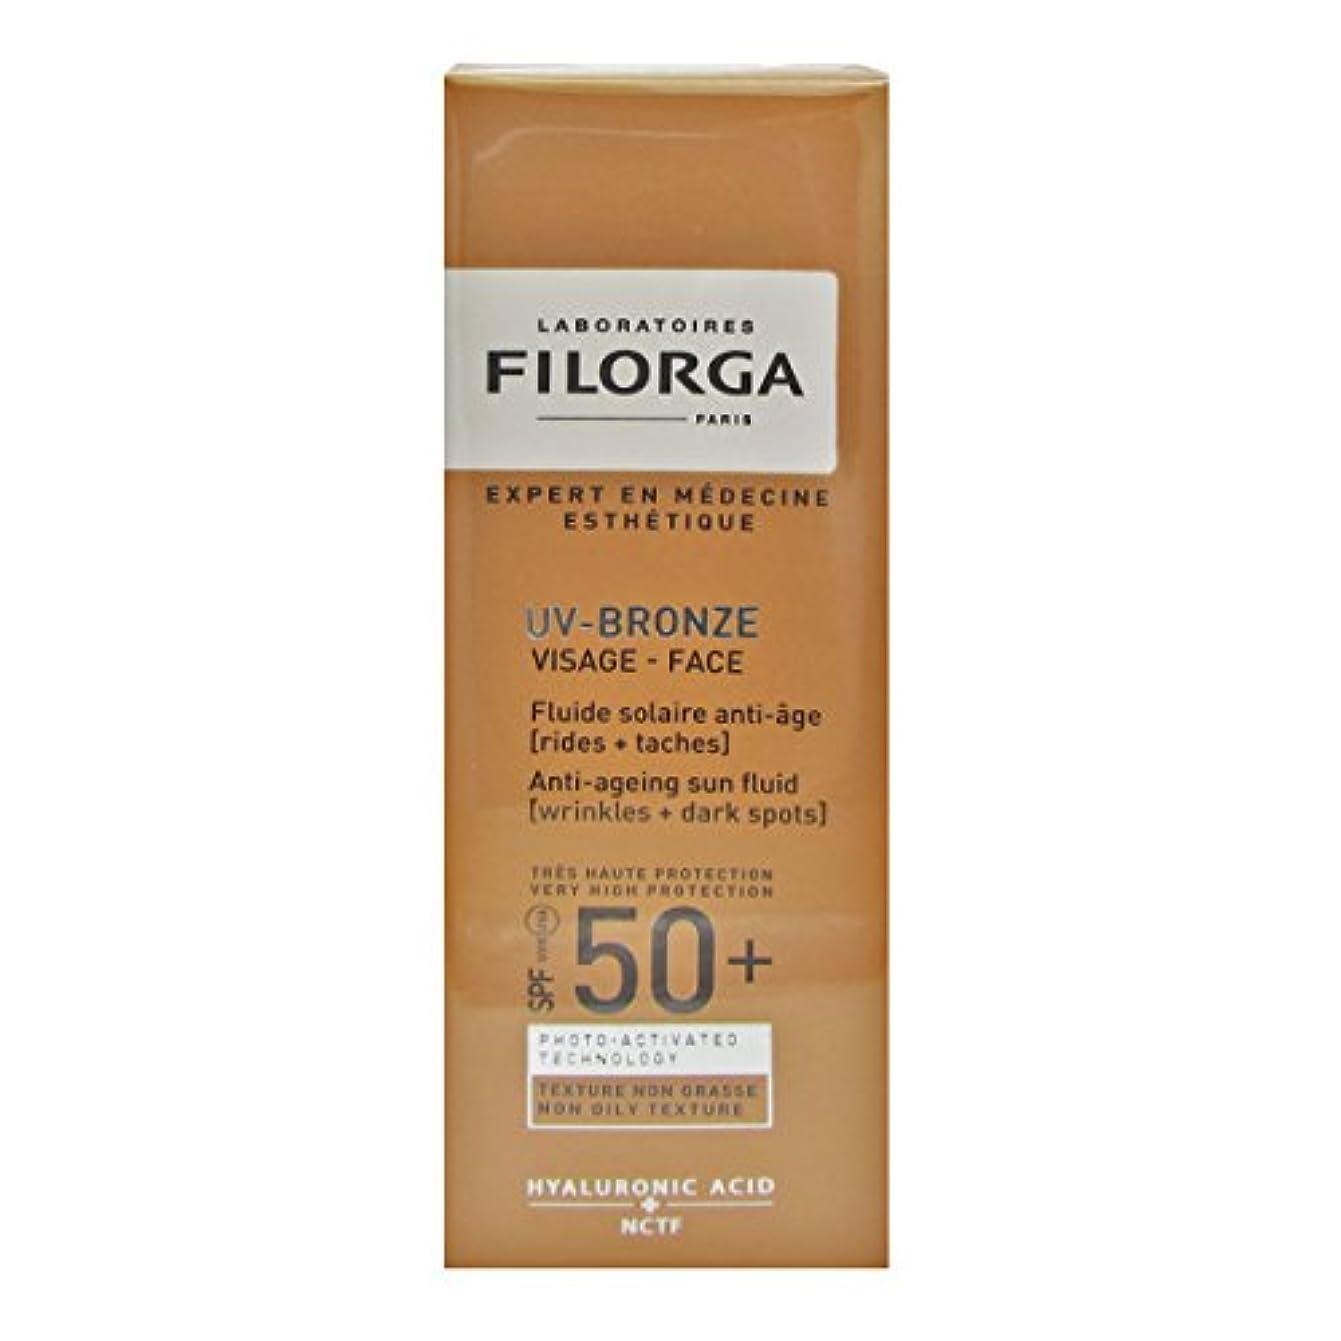 回復社会主義ロープFilorga Uv-bronze Face Fluid Spf50+ 40ml [並行輸入品]